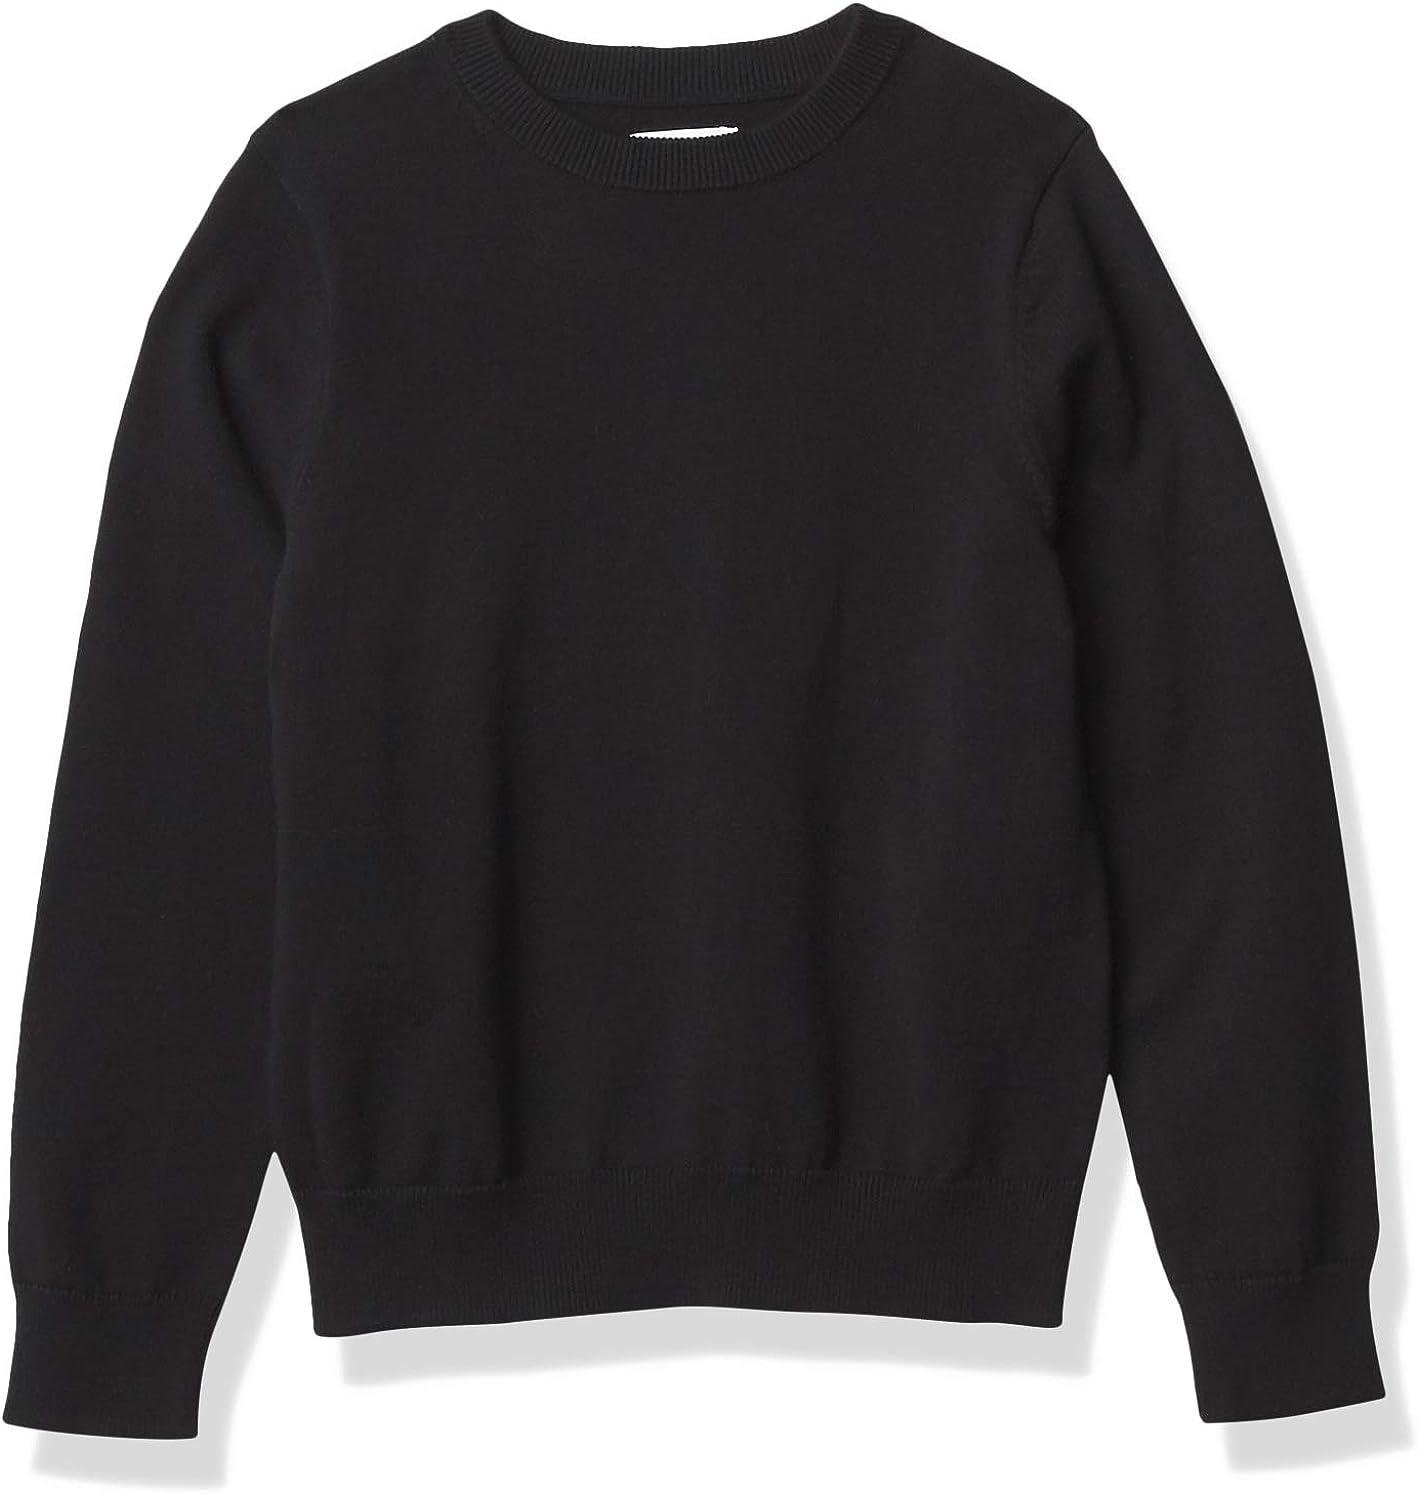 Amazon Essentials Boys' Uniform Cotton Crew-Neck Sweaters